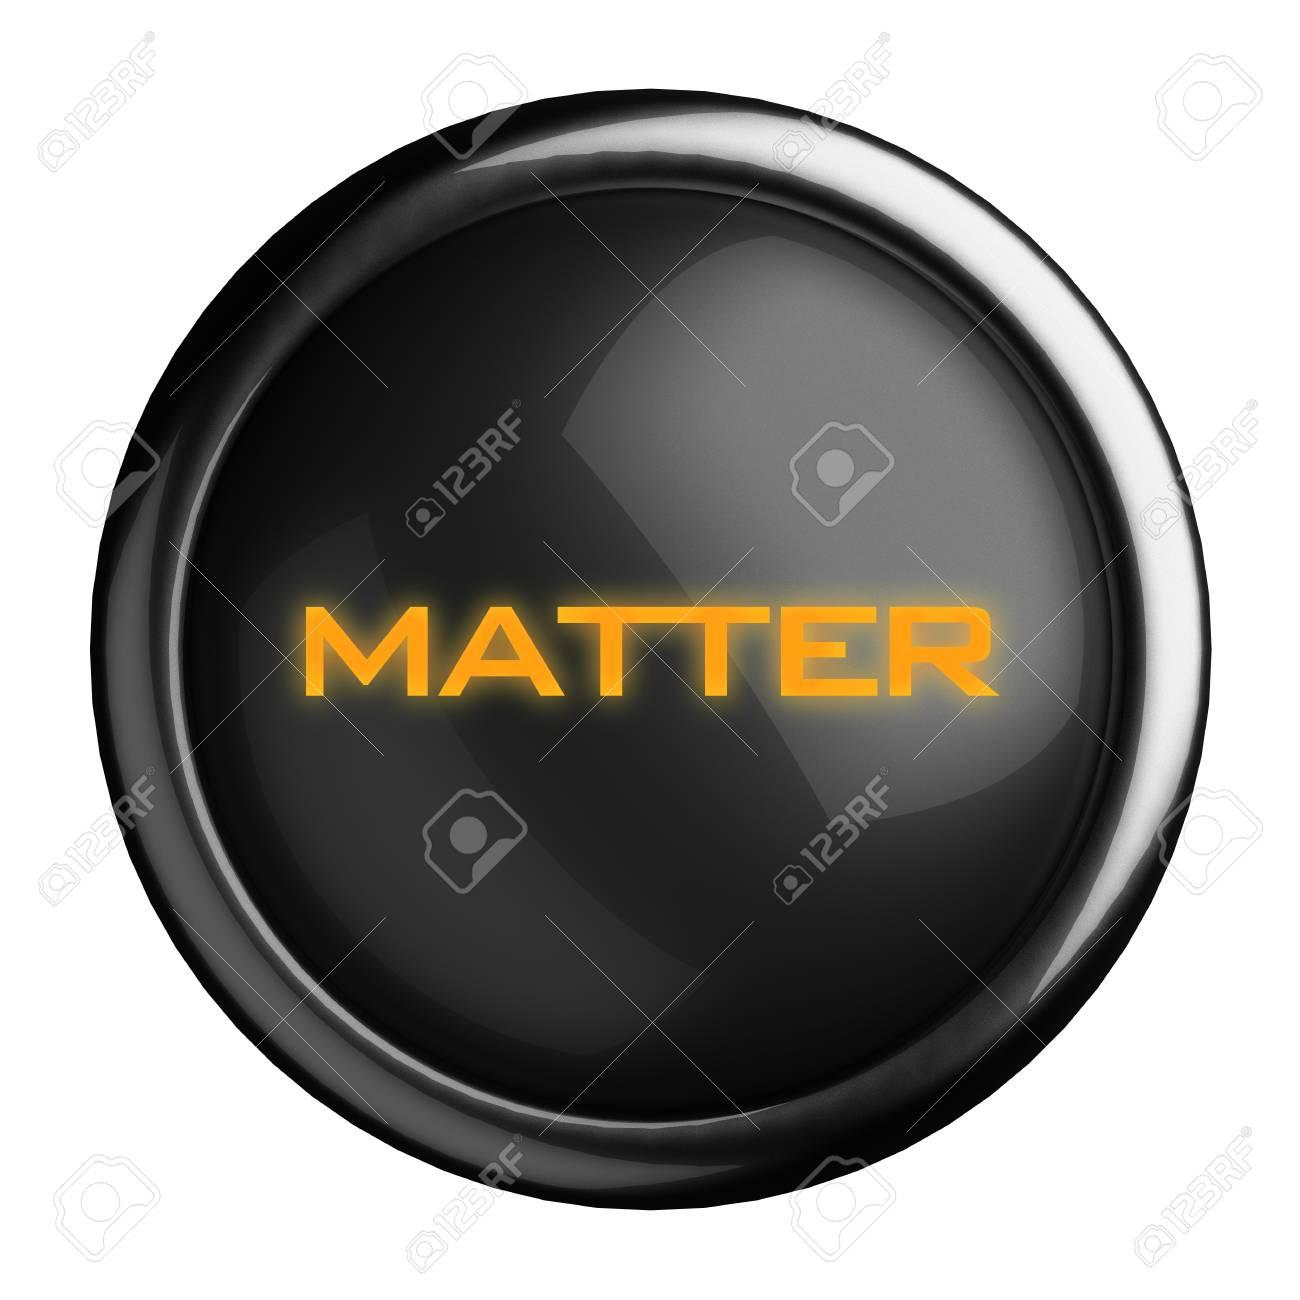 Word on black button Stock Photo - 15696382